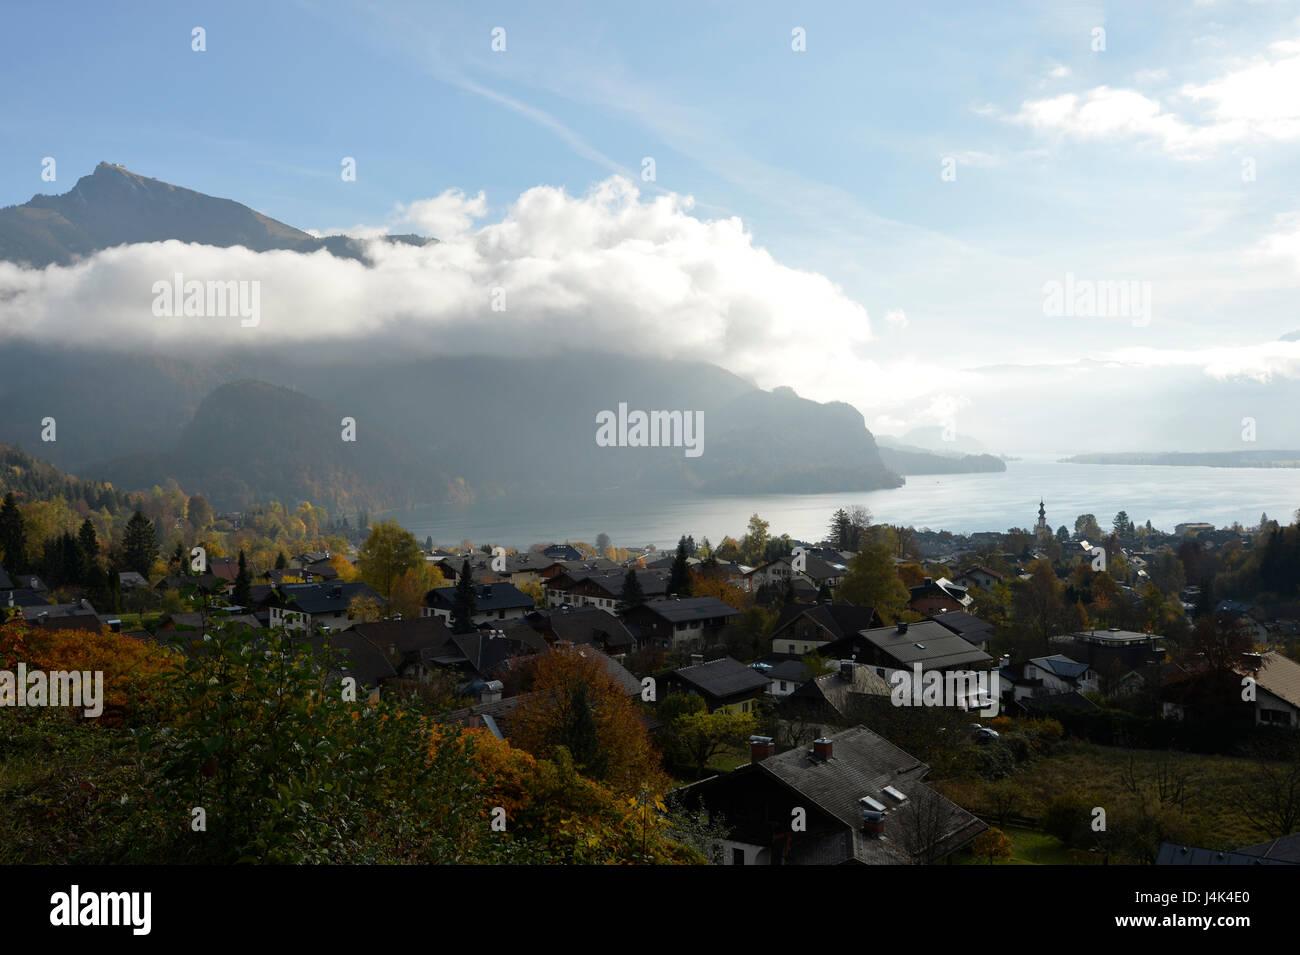 St. Gilgen and Lake Wolfgang, Salzkammergut, Austria in Autumn - Stock Image